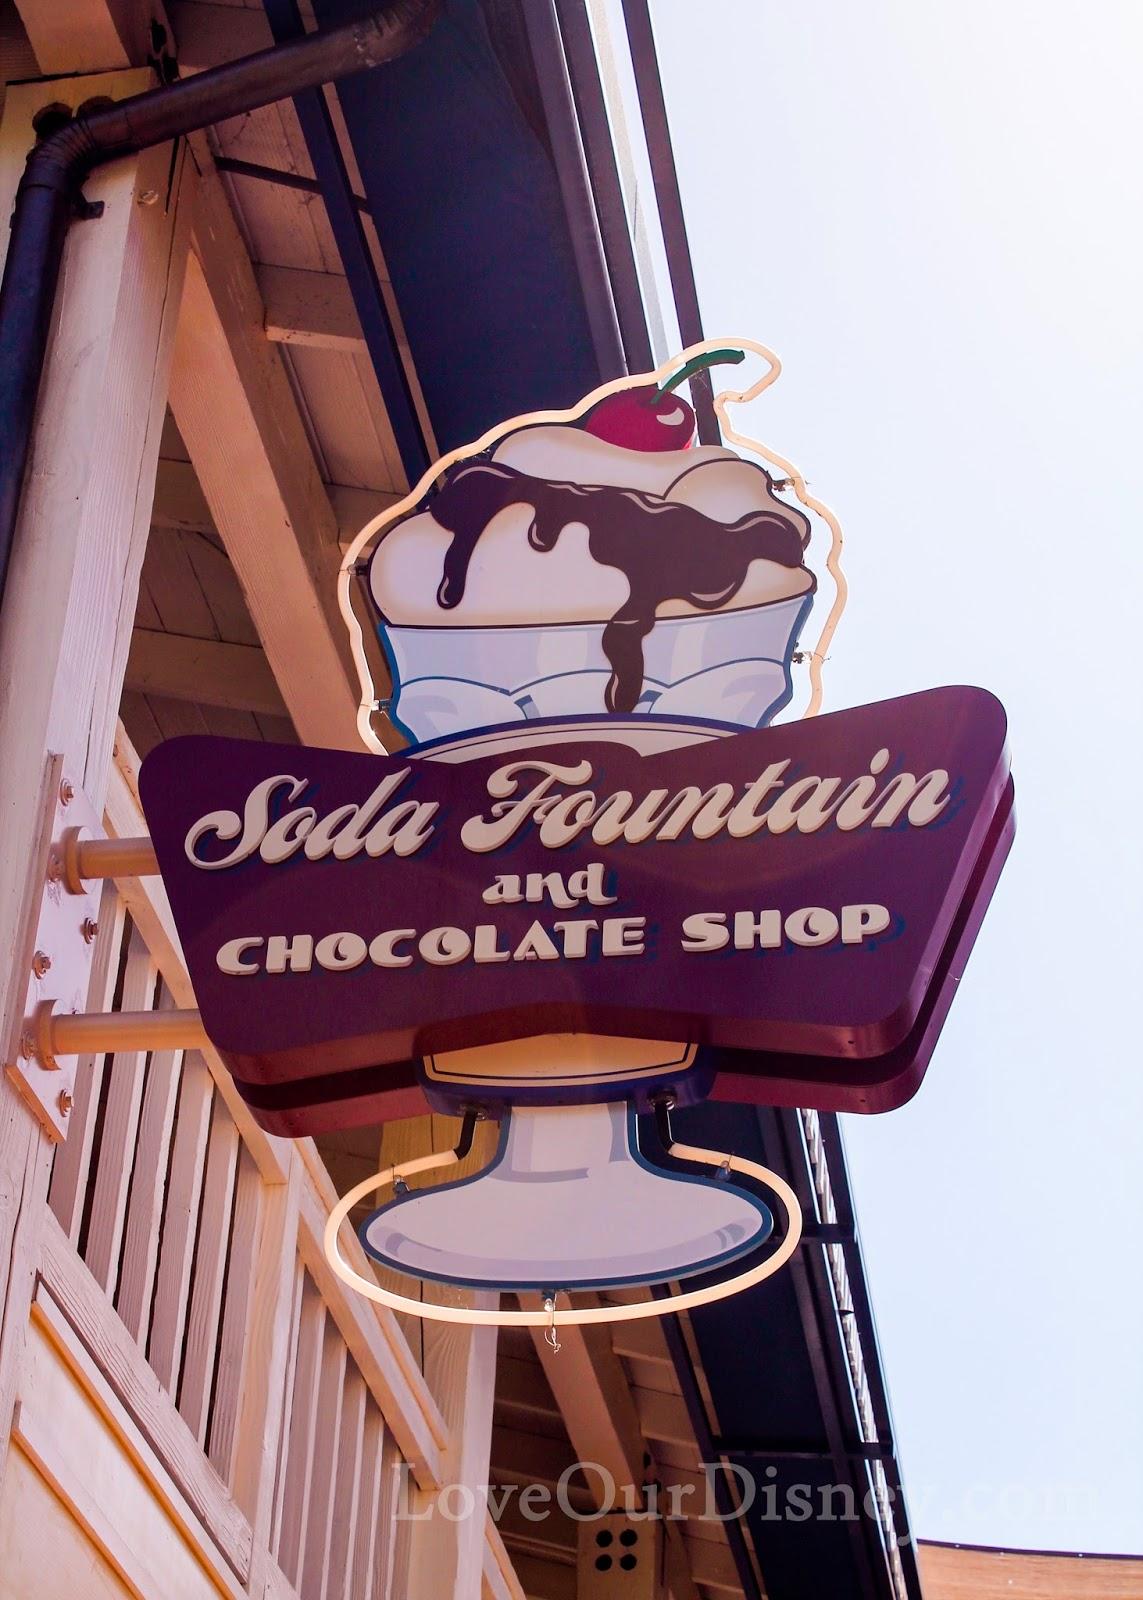 Best Ice Cream at Disneyland Resort